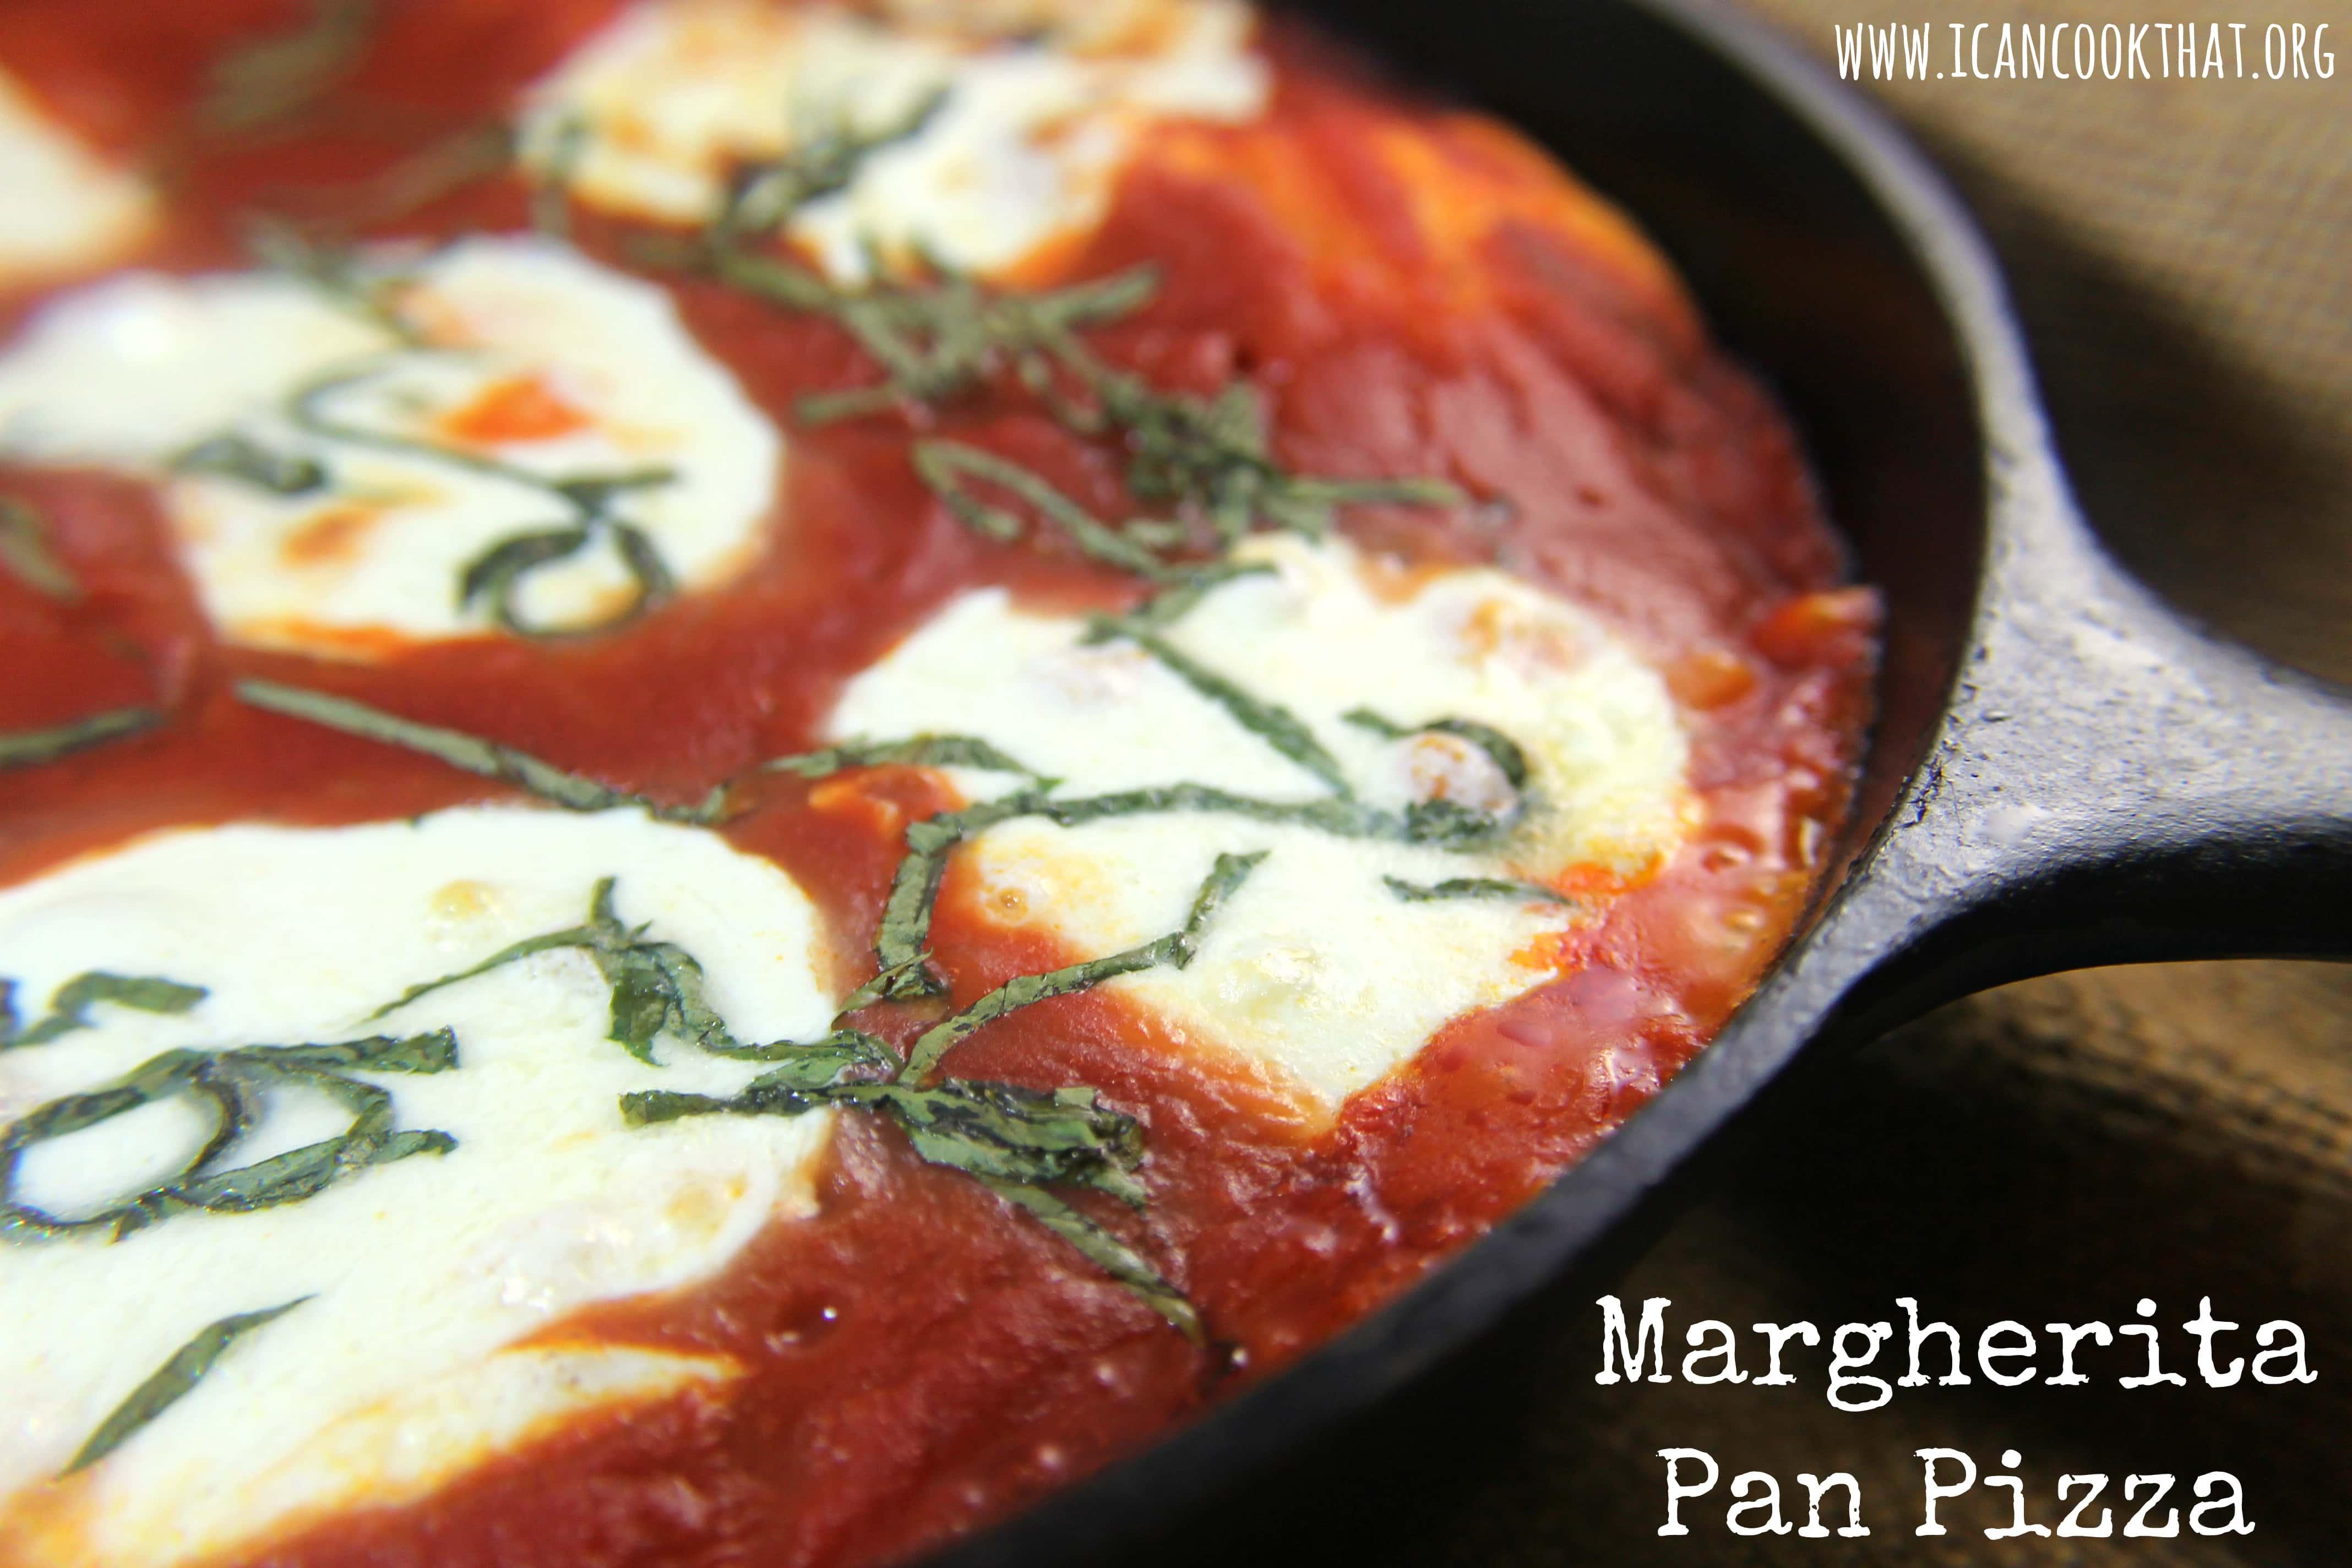 Margherita Pan Pizza